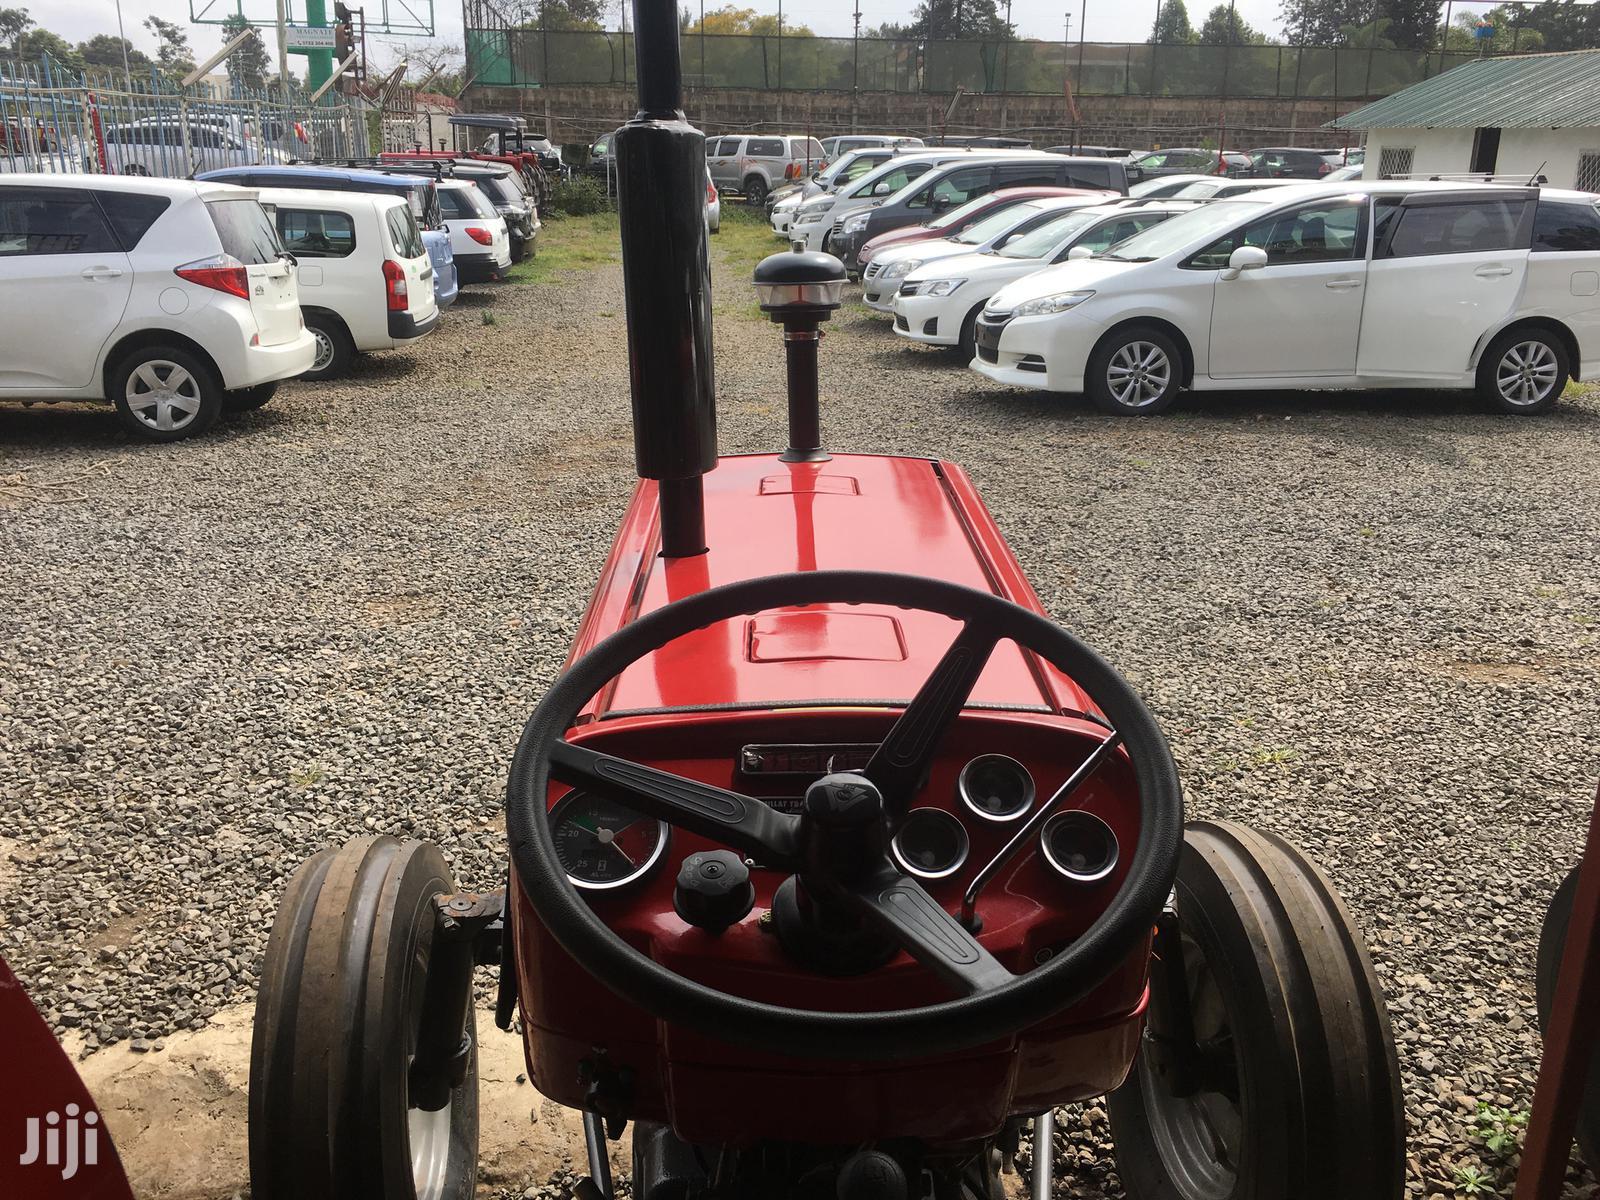 Massey Ferguson 260 2wd Tractor | Heavy Equipment for sale in Kilimani, Nairobi, Kenya